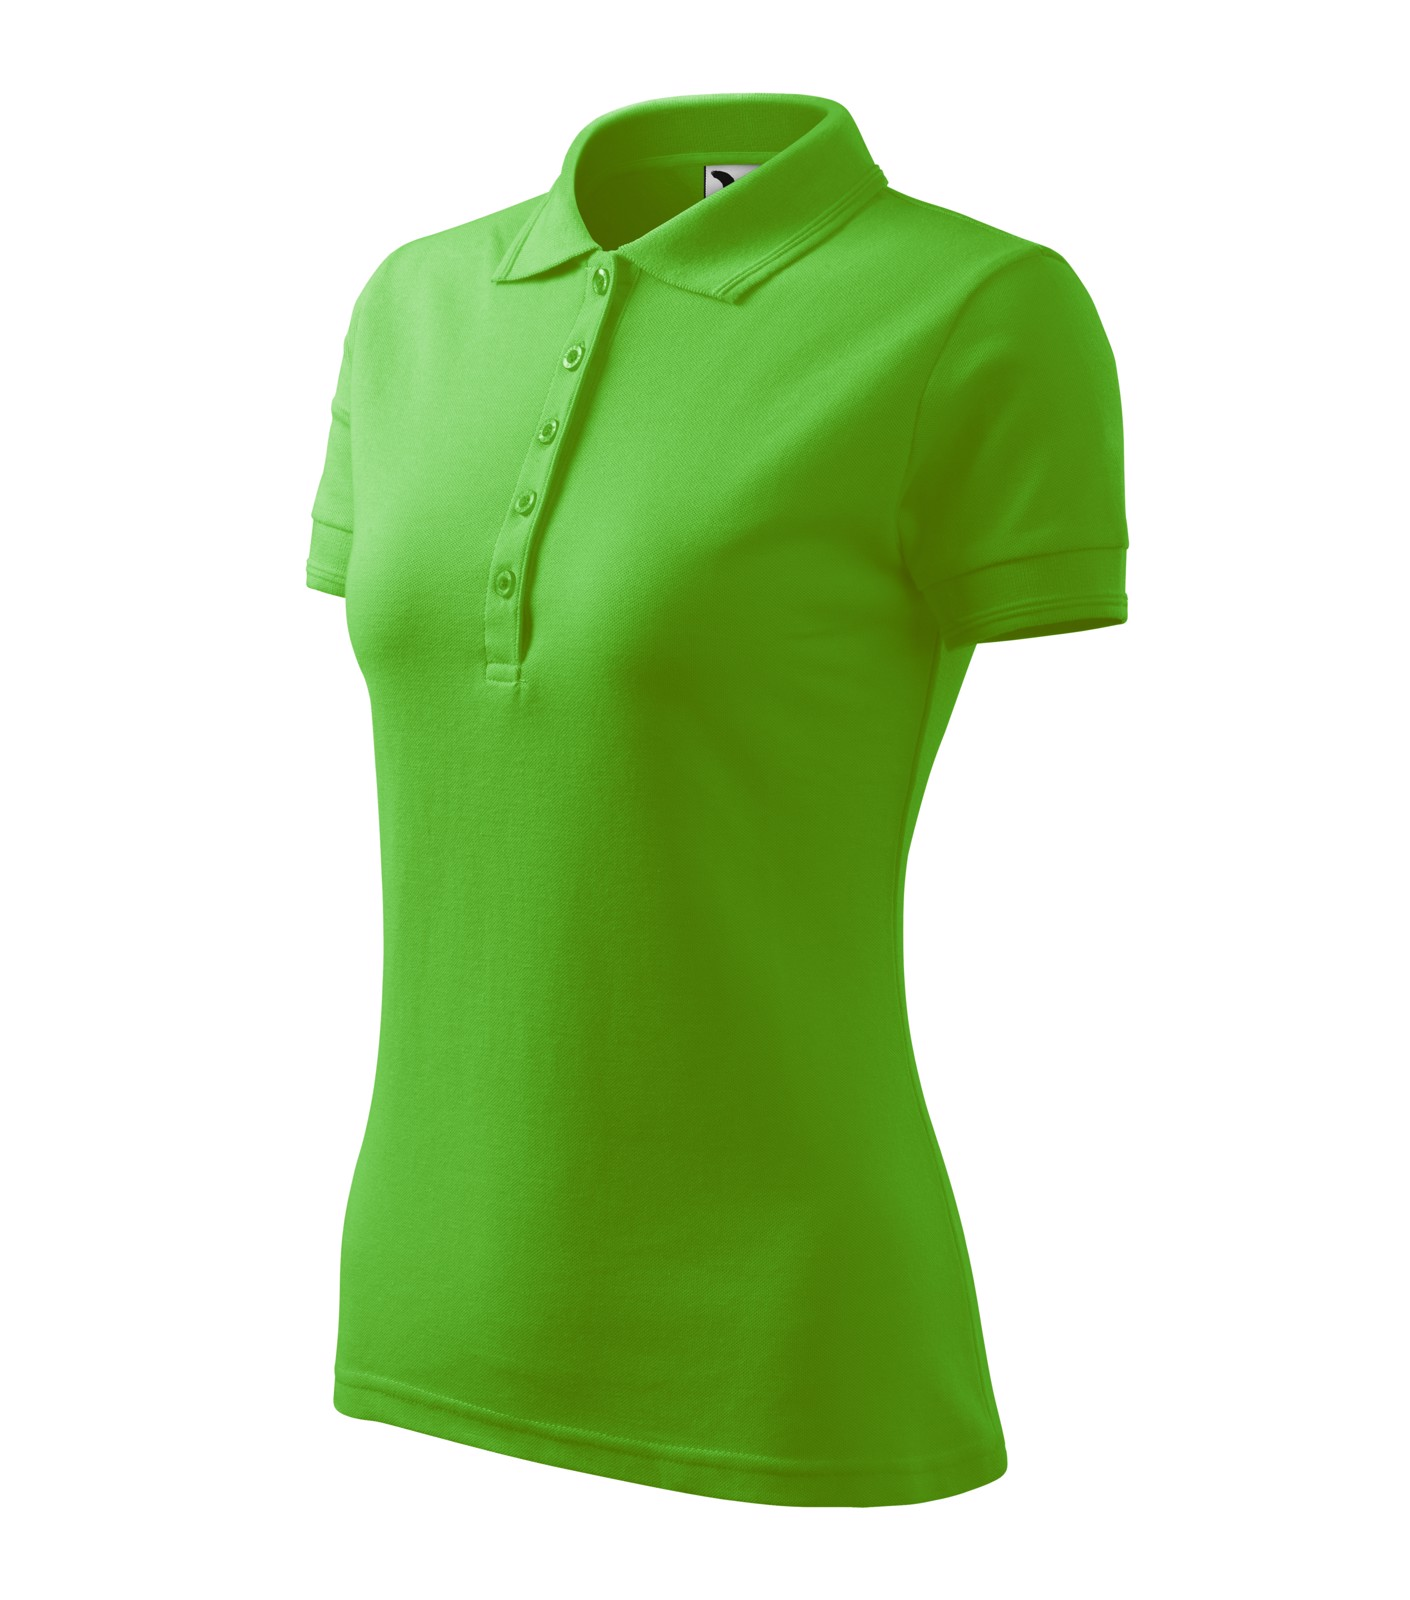 Polo Shirt Ladies Malfini Pique Polo - Apple Green / XL